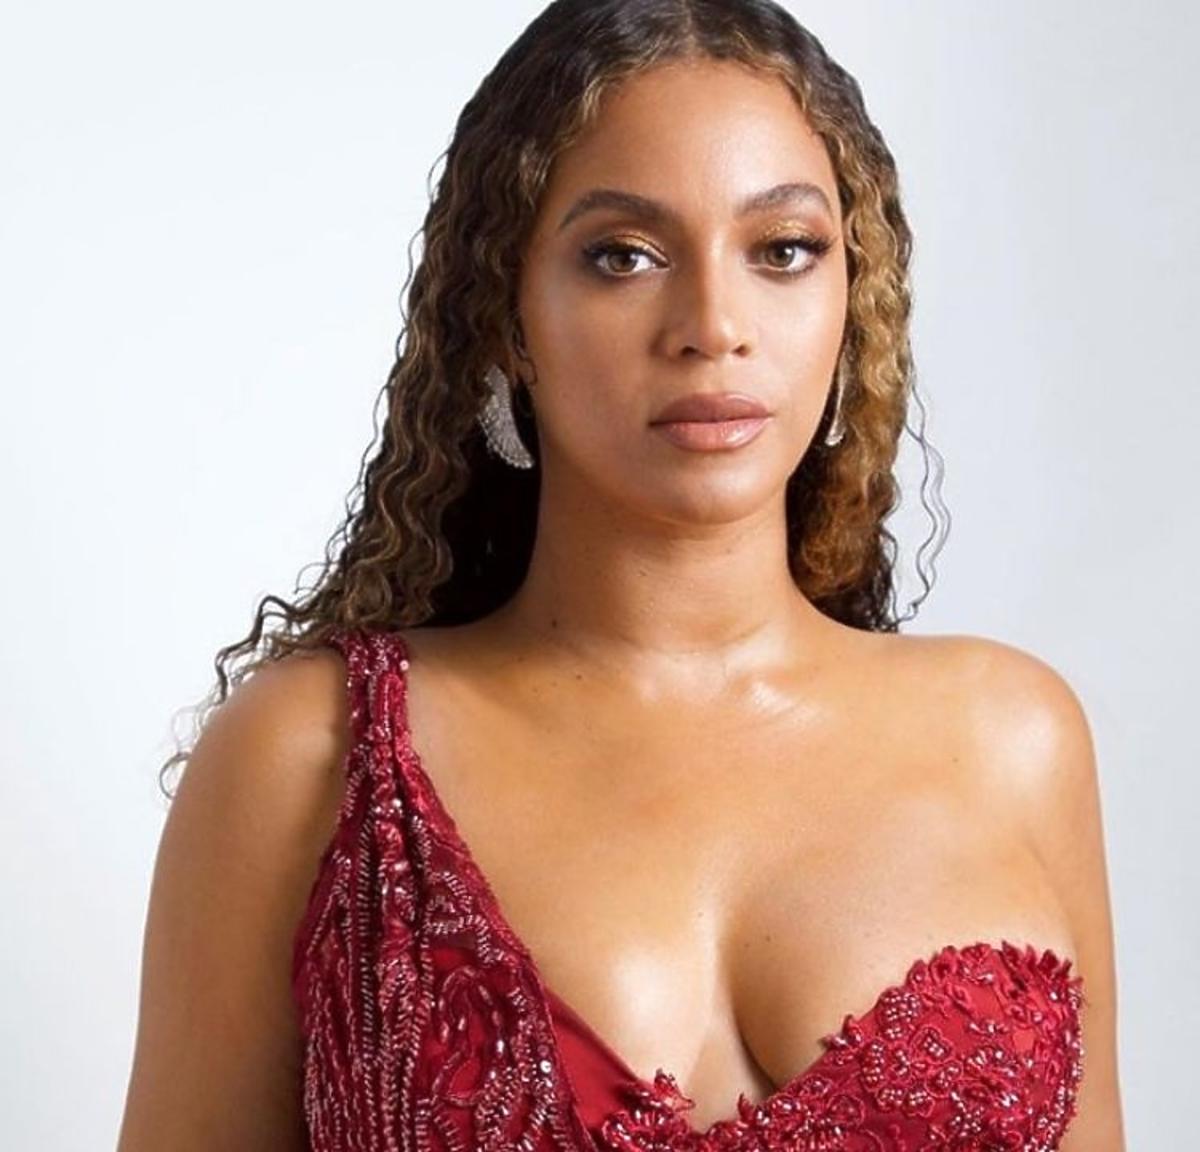 Karbowane fale - Beyonce